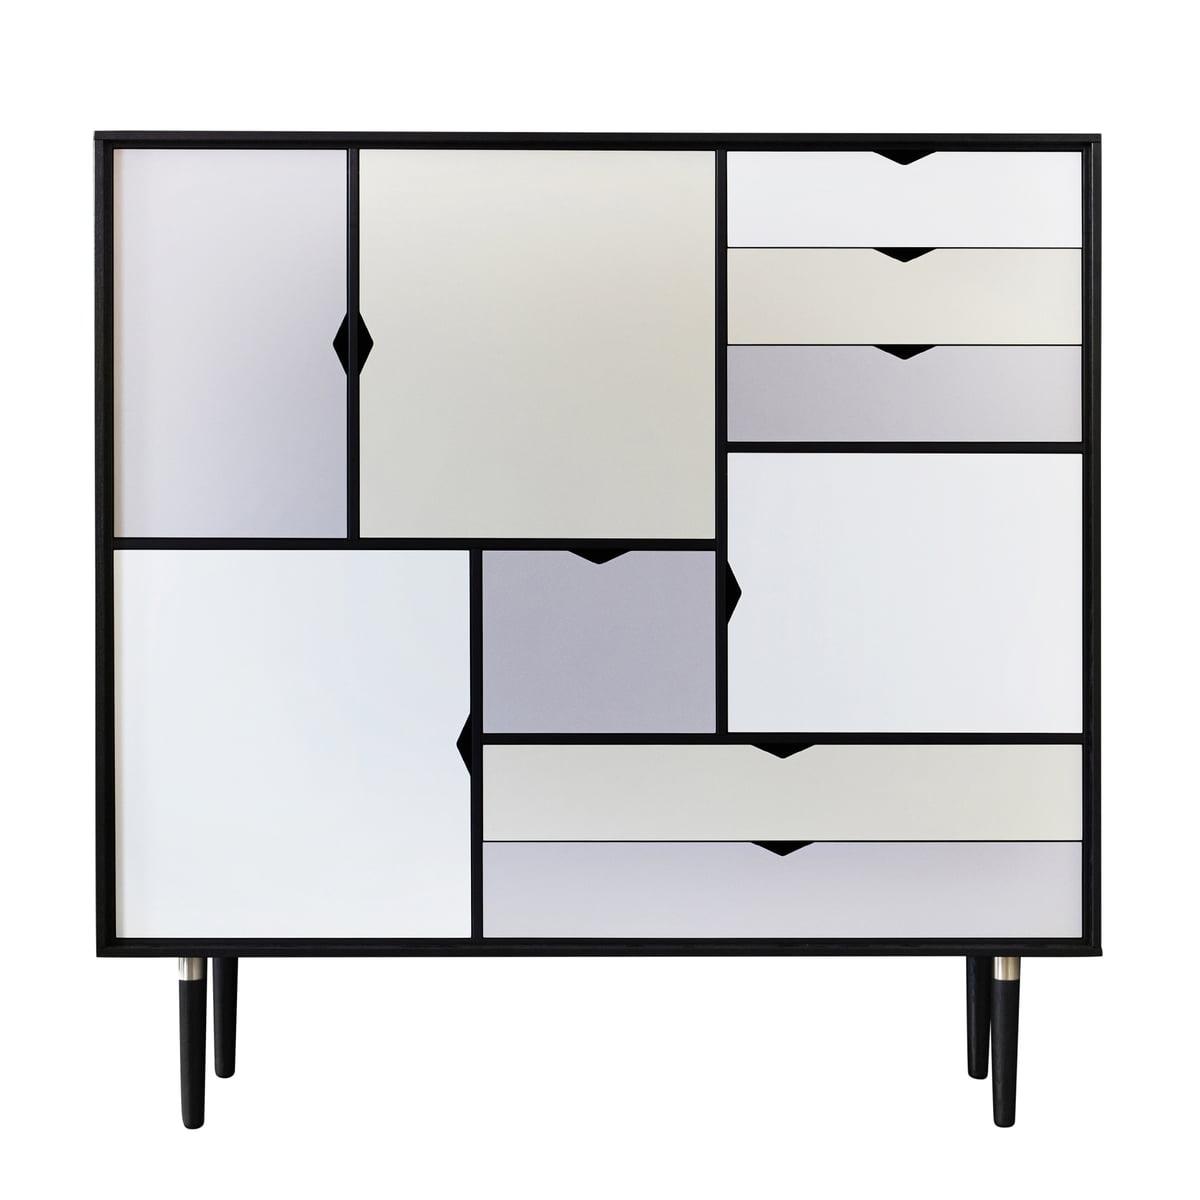 S3 sideboard multicoloured andersen furniture for Sideboard 3 meter lang